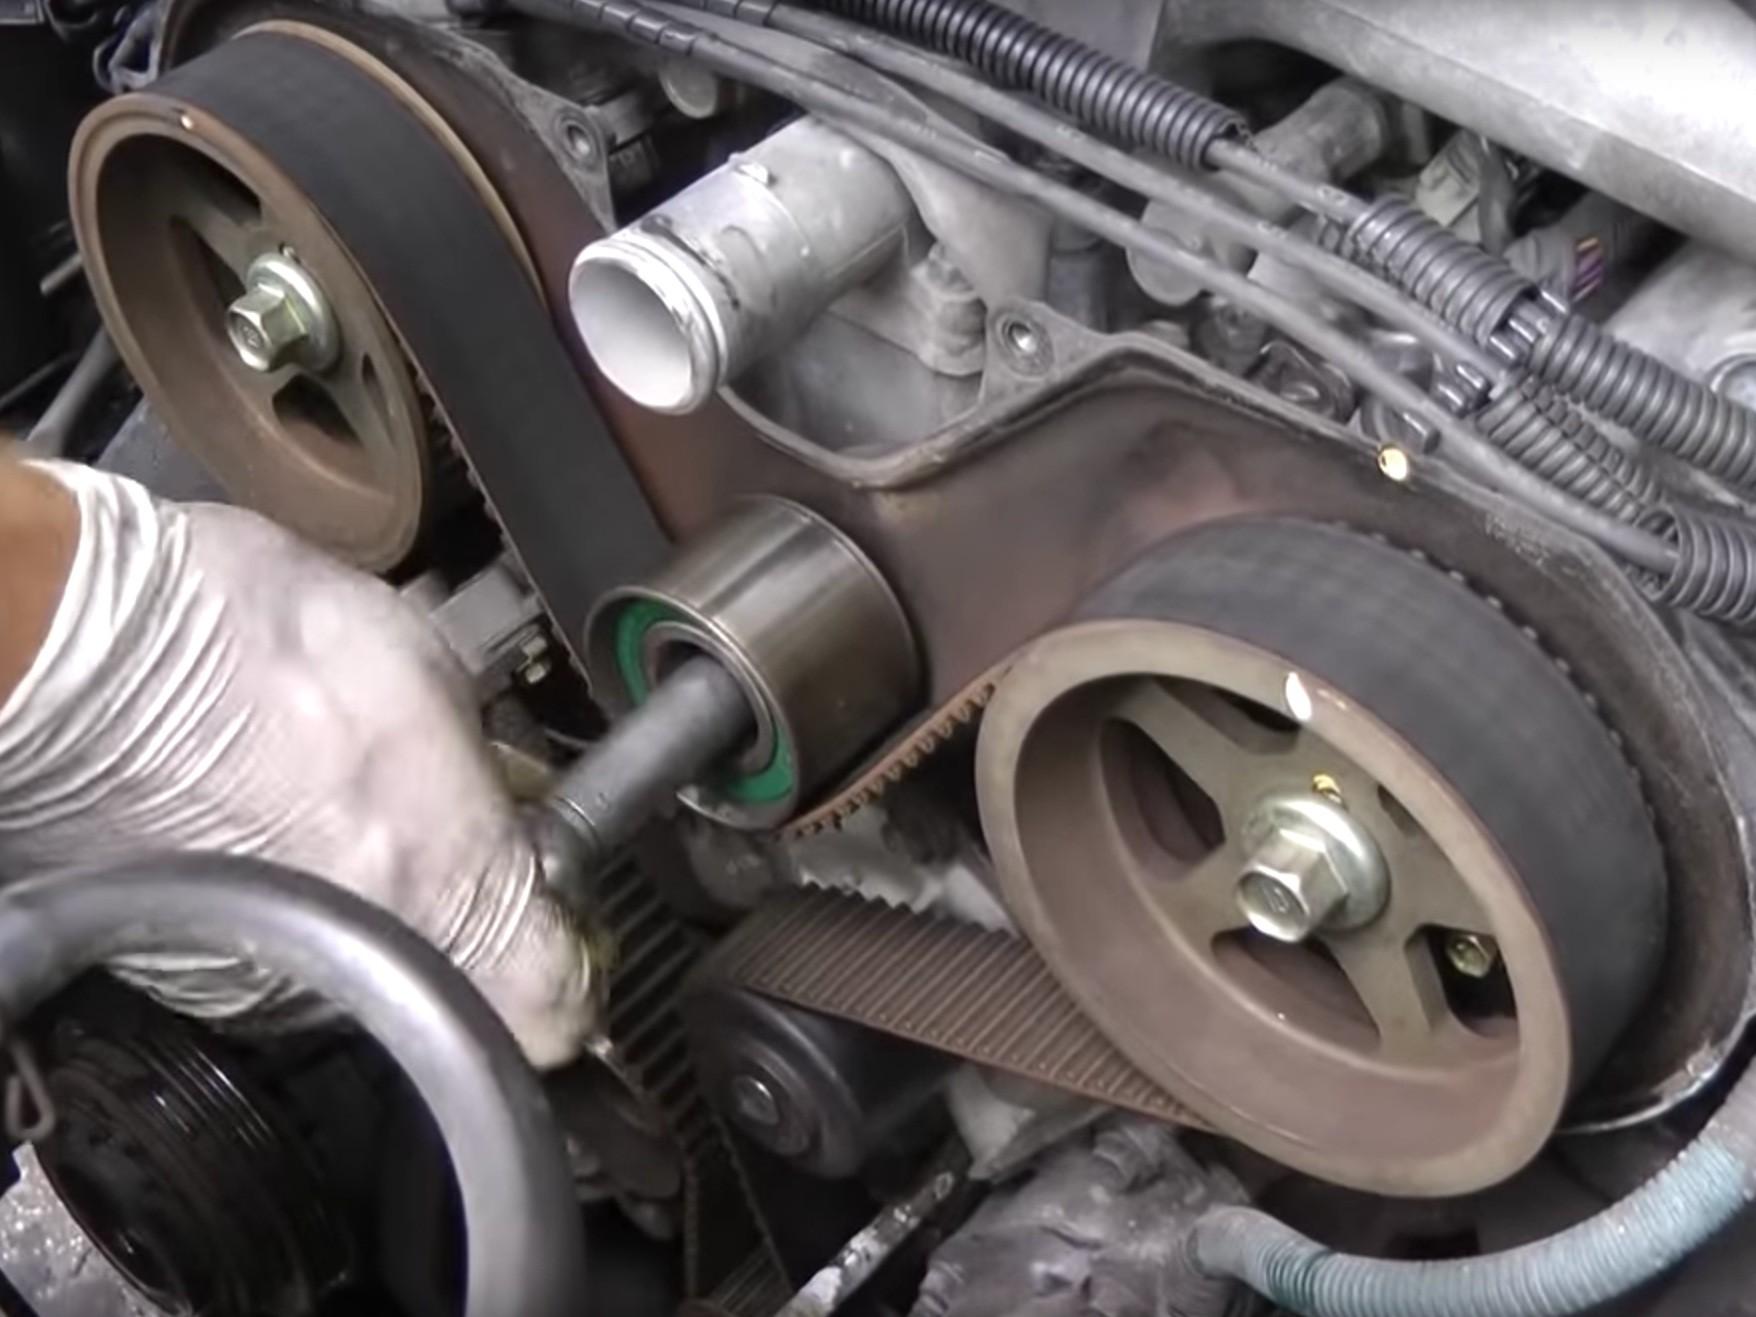 V4 Engine Diagram 1995 2002 toyota 4runner 3 4l Timing Belt Water Pump Replacement Of V4 Engine Diagram